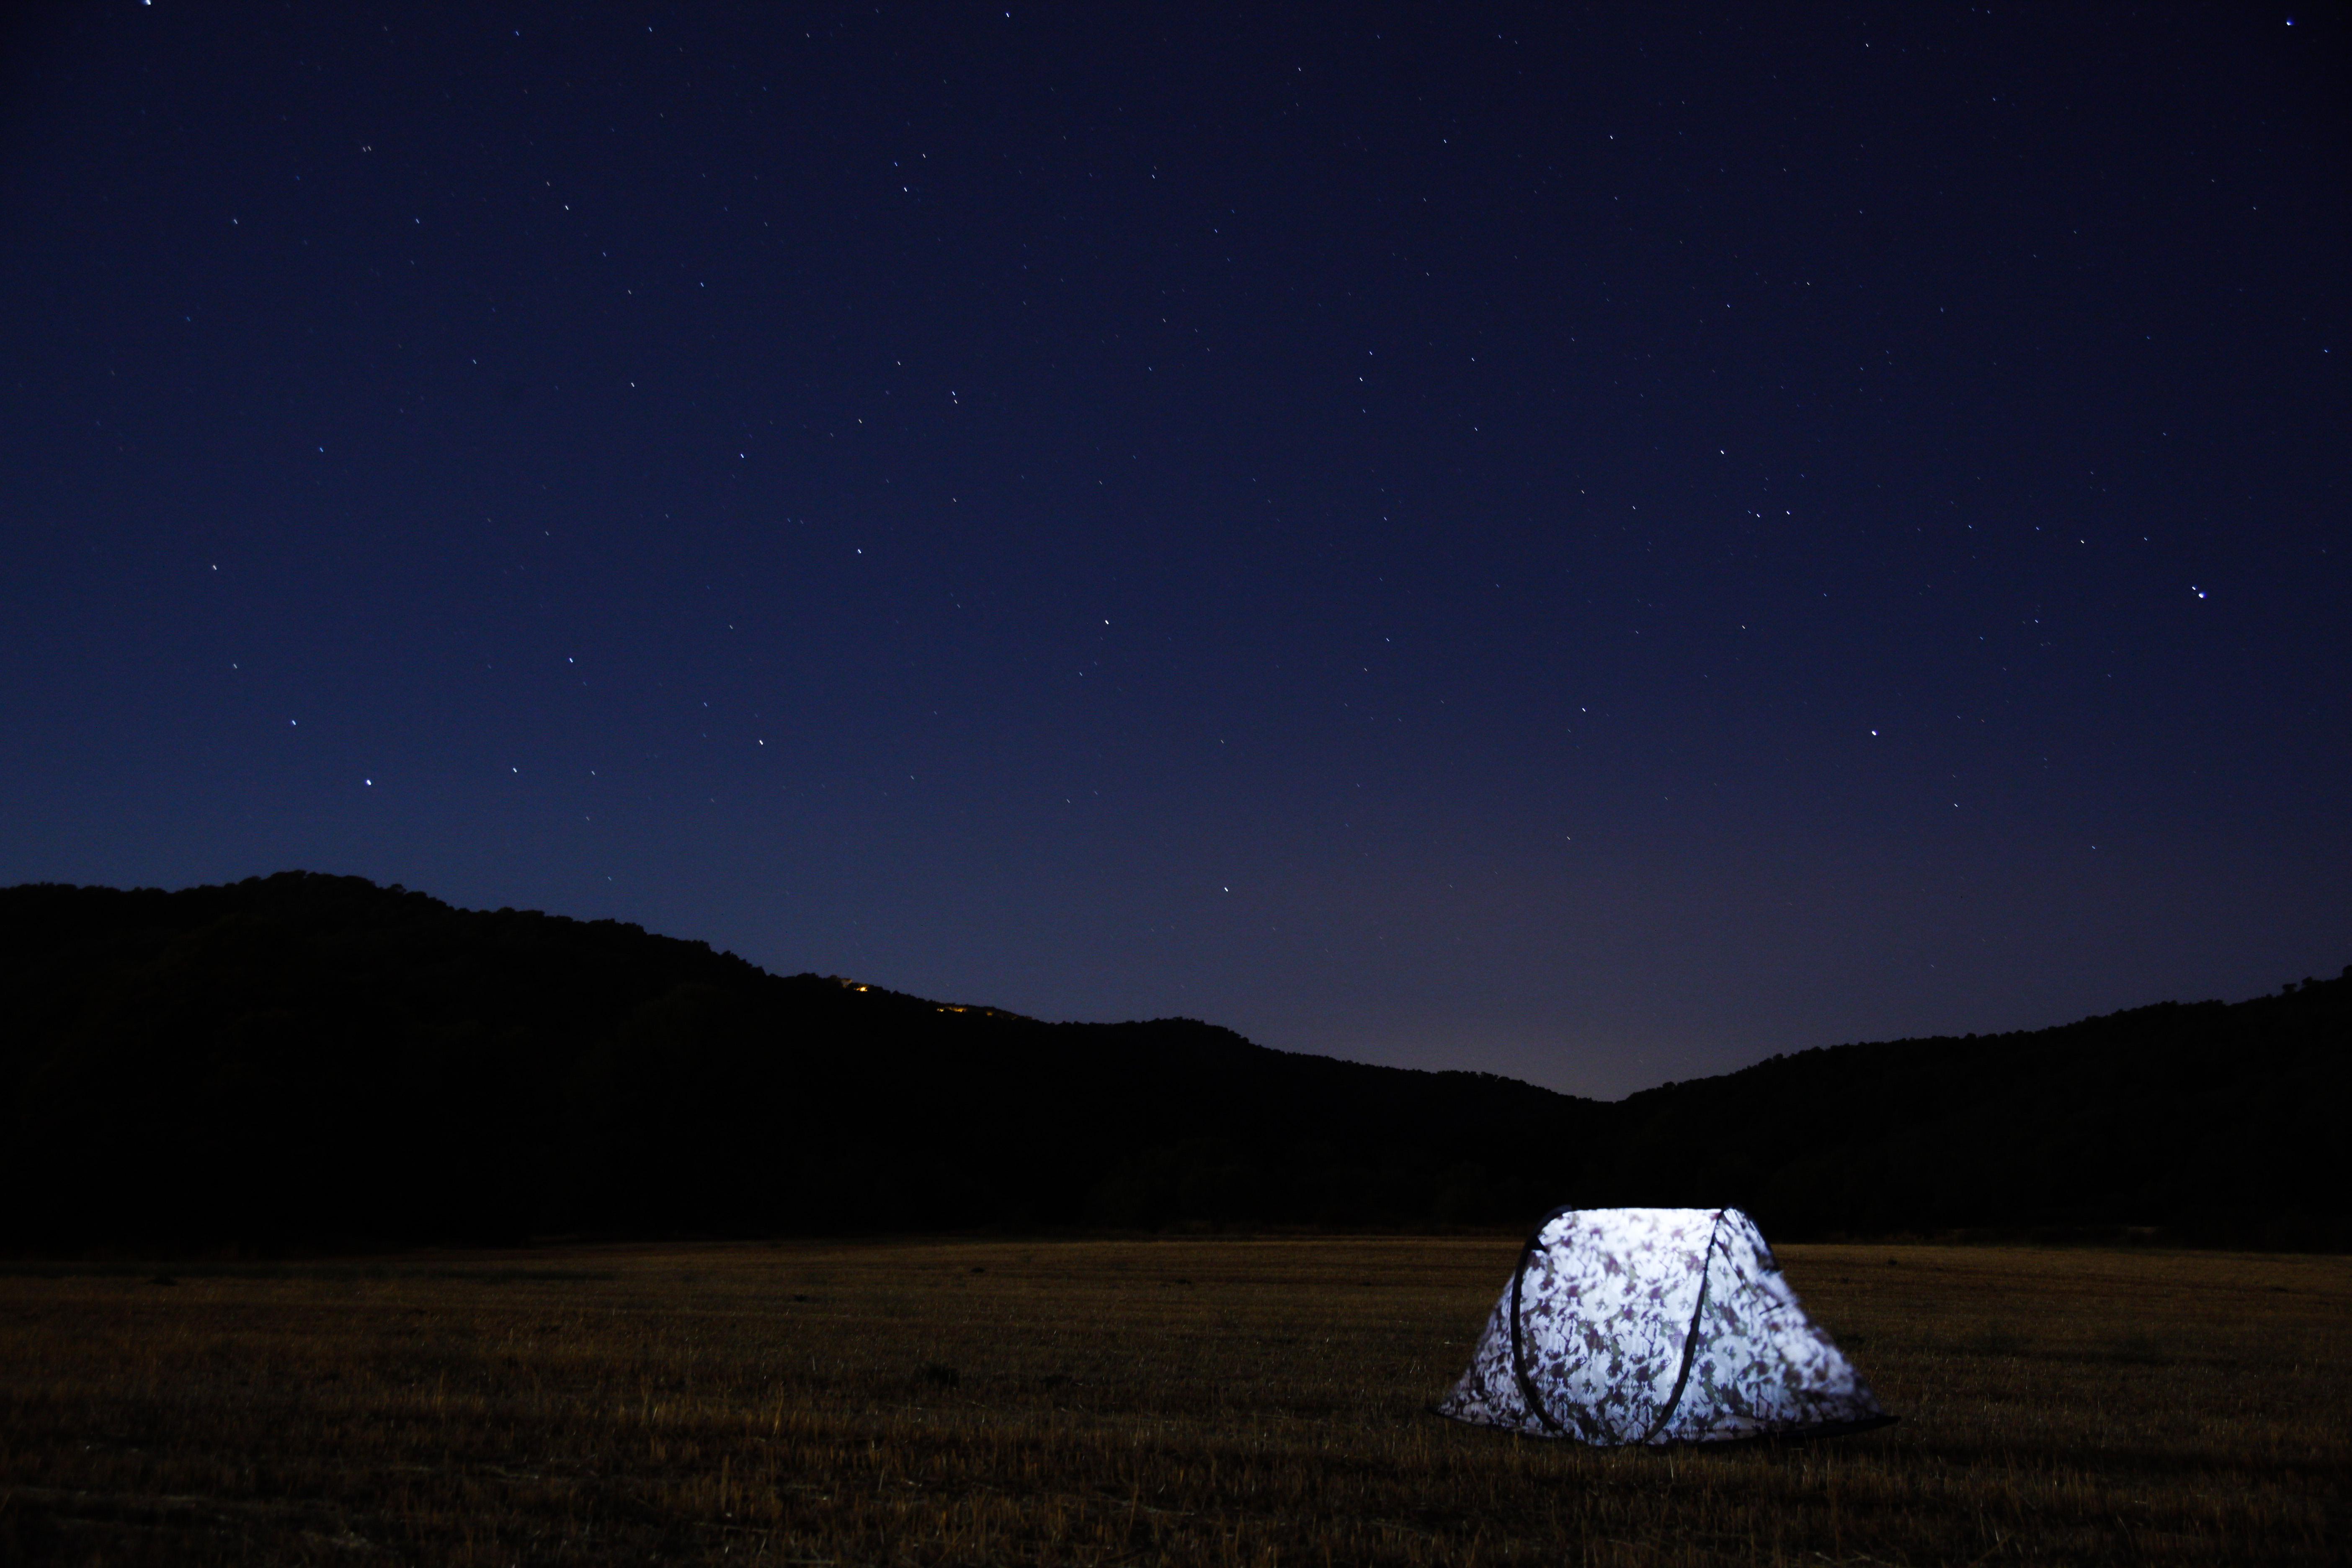 free images   landscape  grass  horizon  silhouette  mountain  light  sky  night  star  dawn